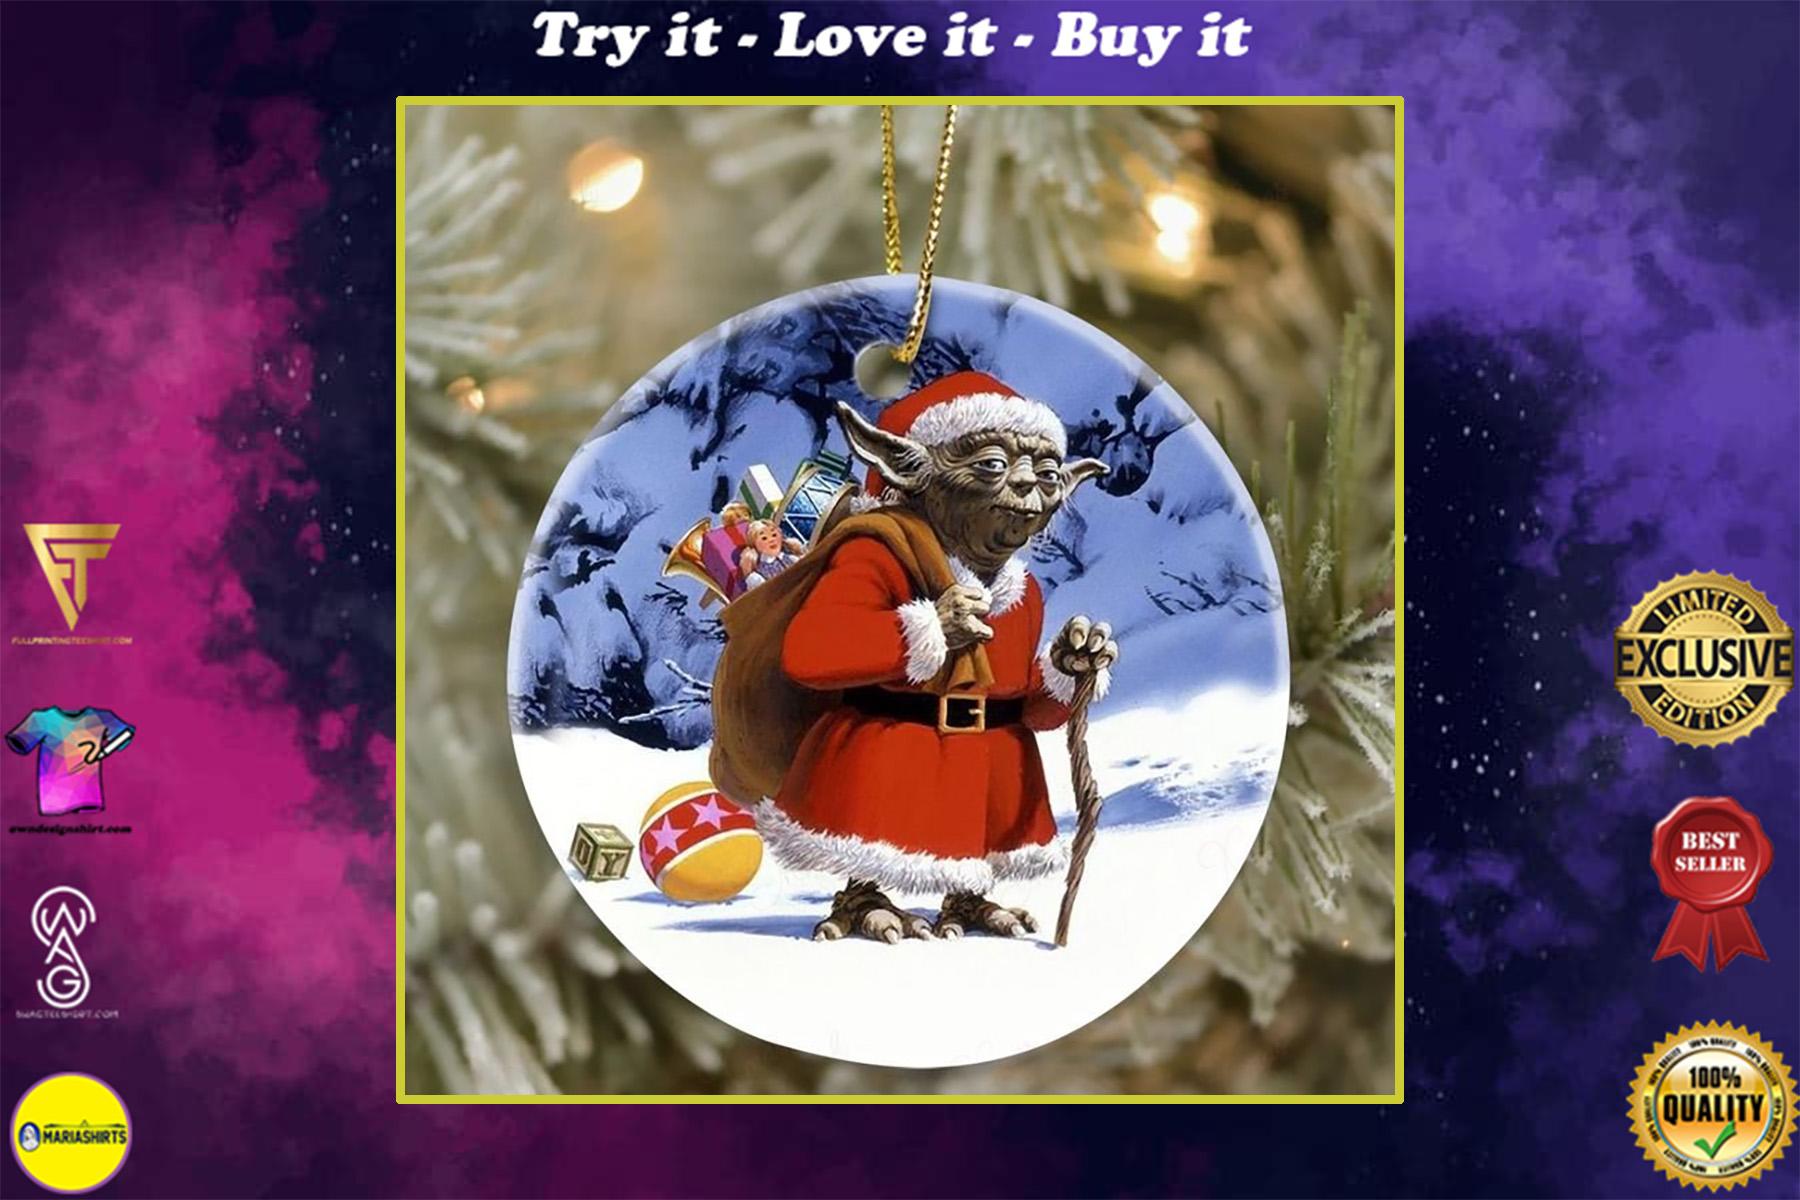 star wars yoda cosplay santa christmas ornament